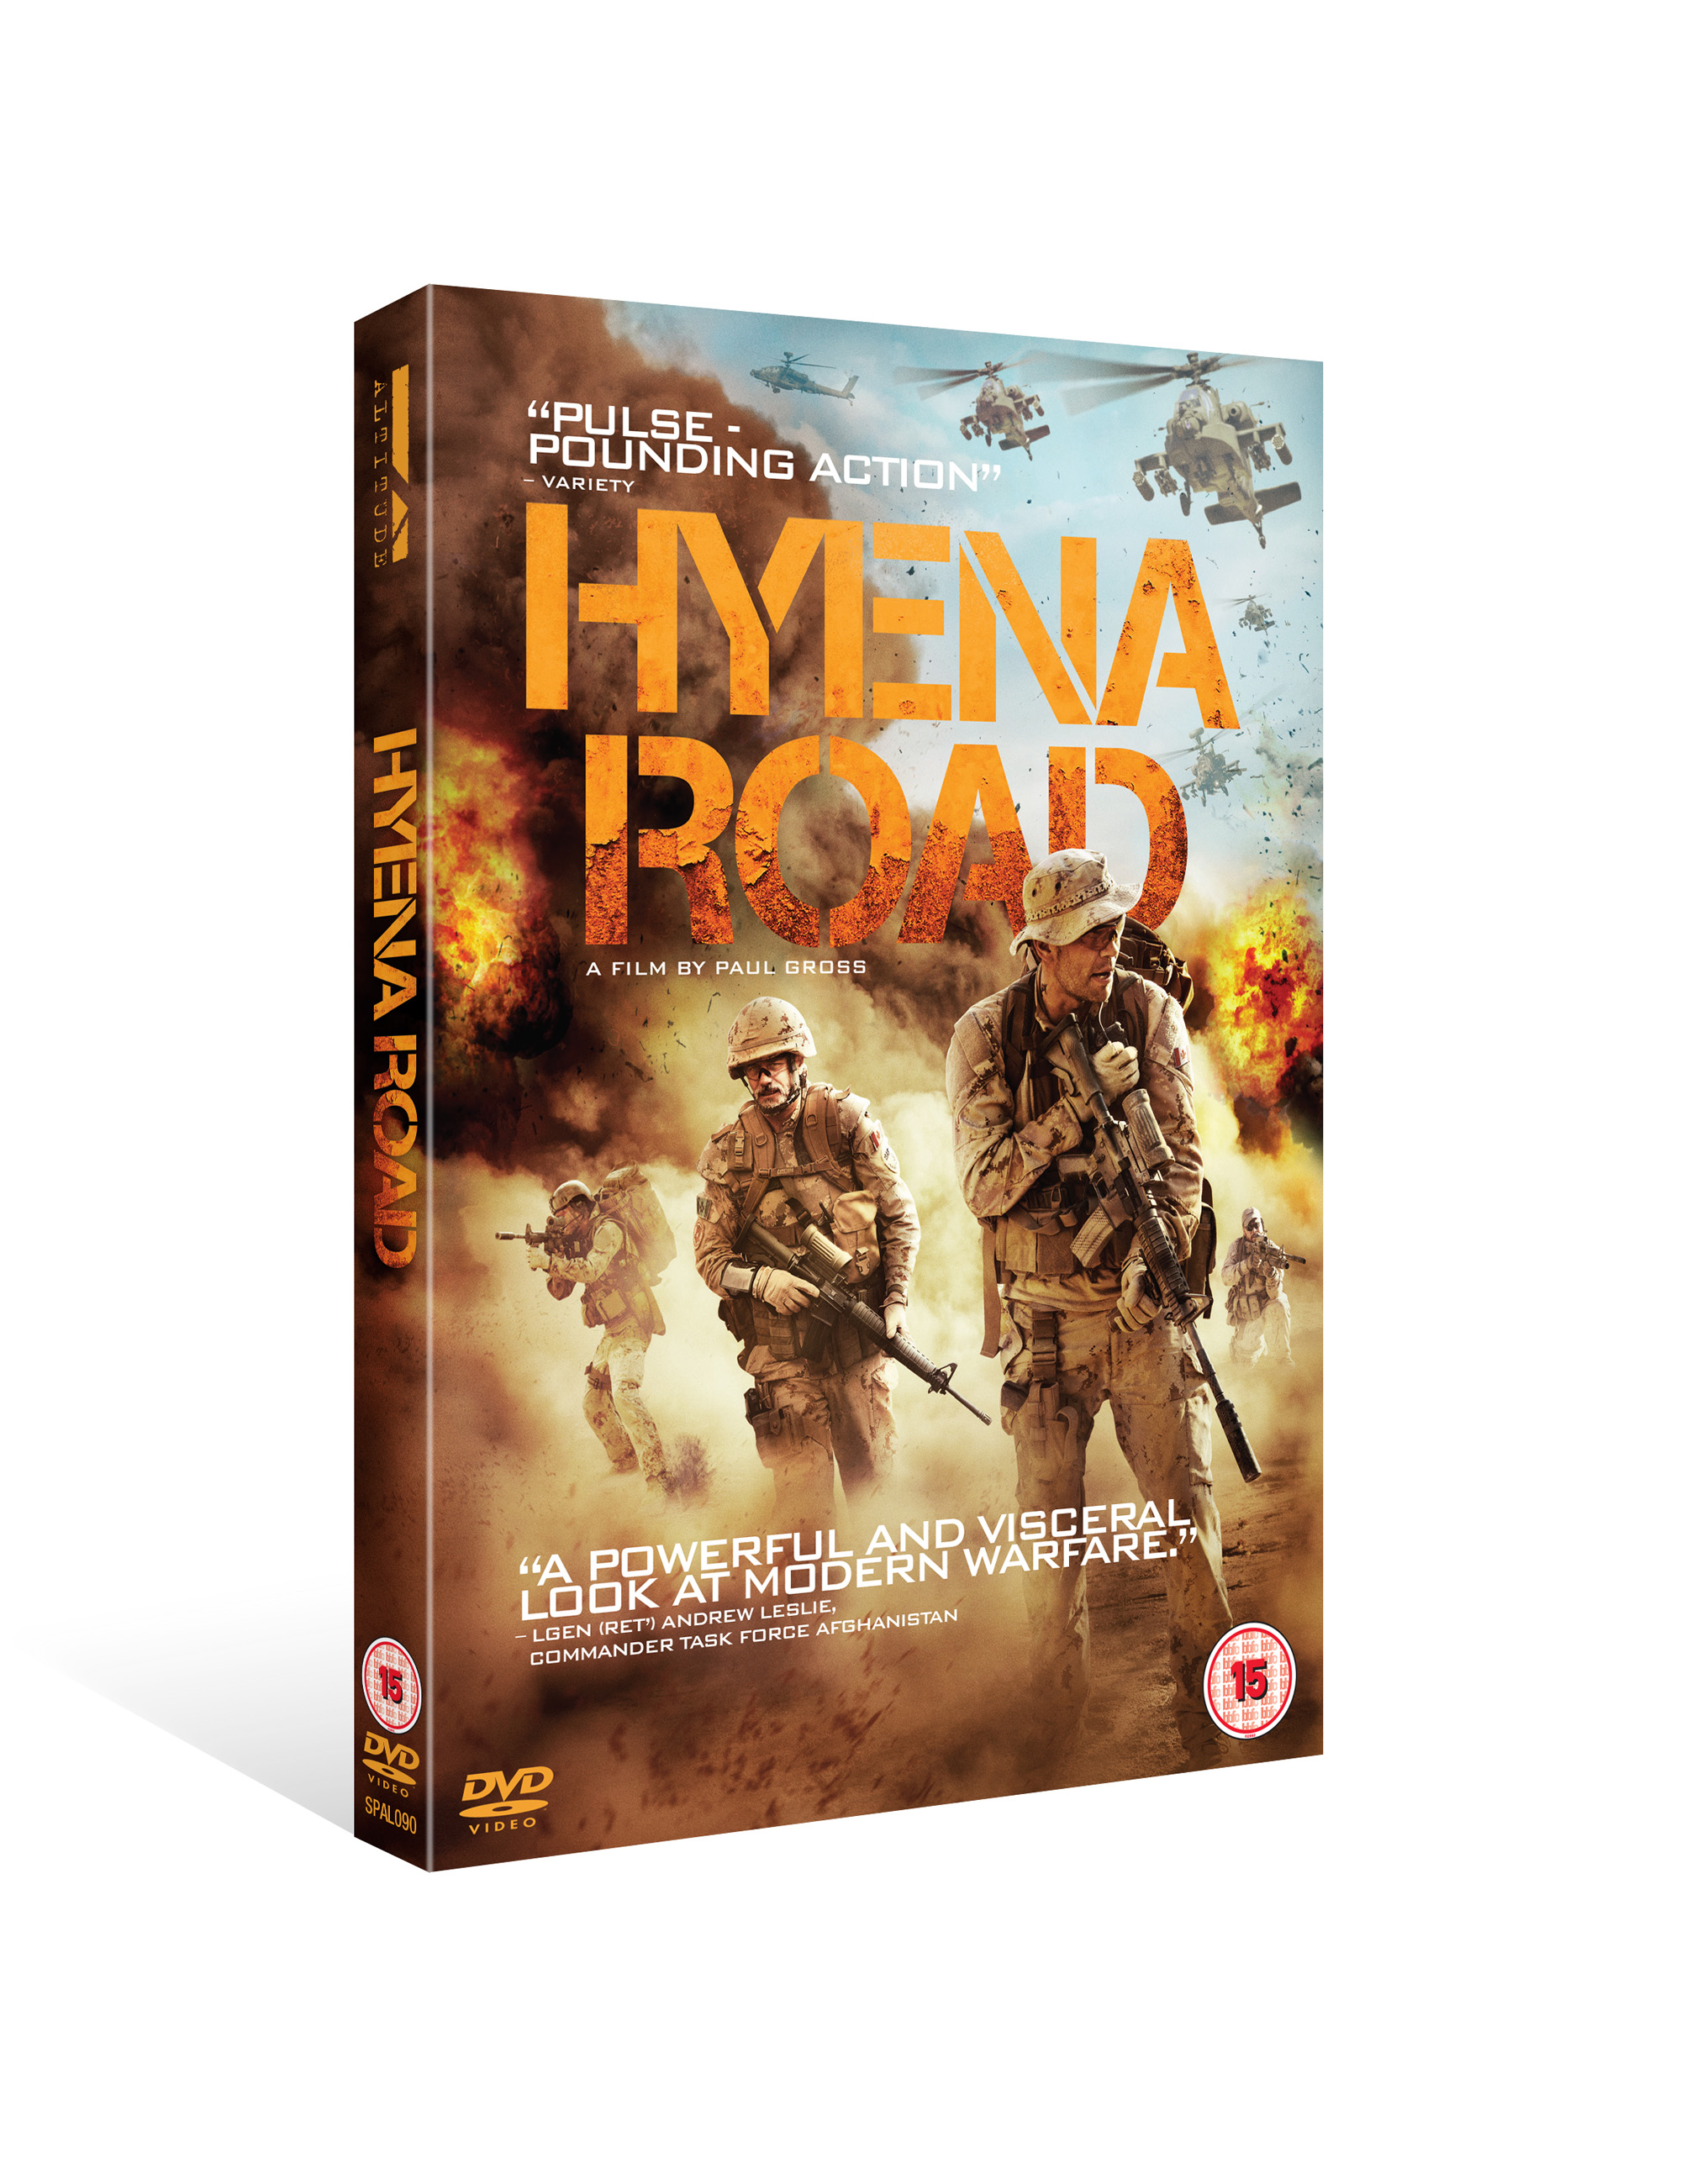 Hyena-road_MasterPackshot